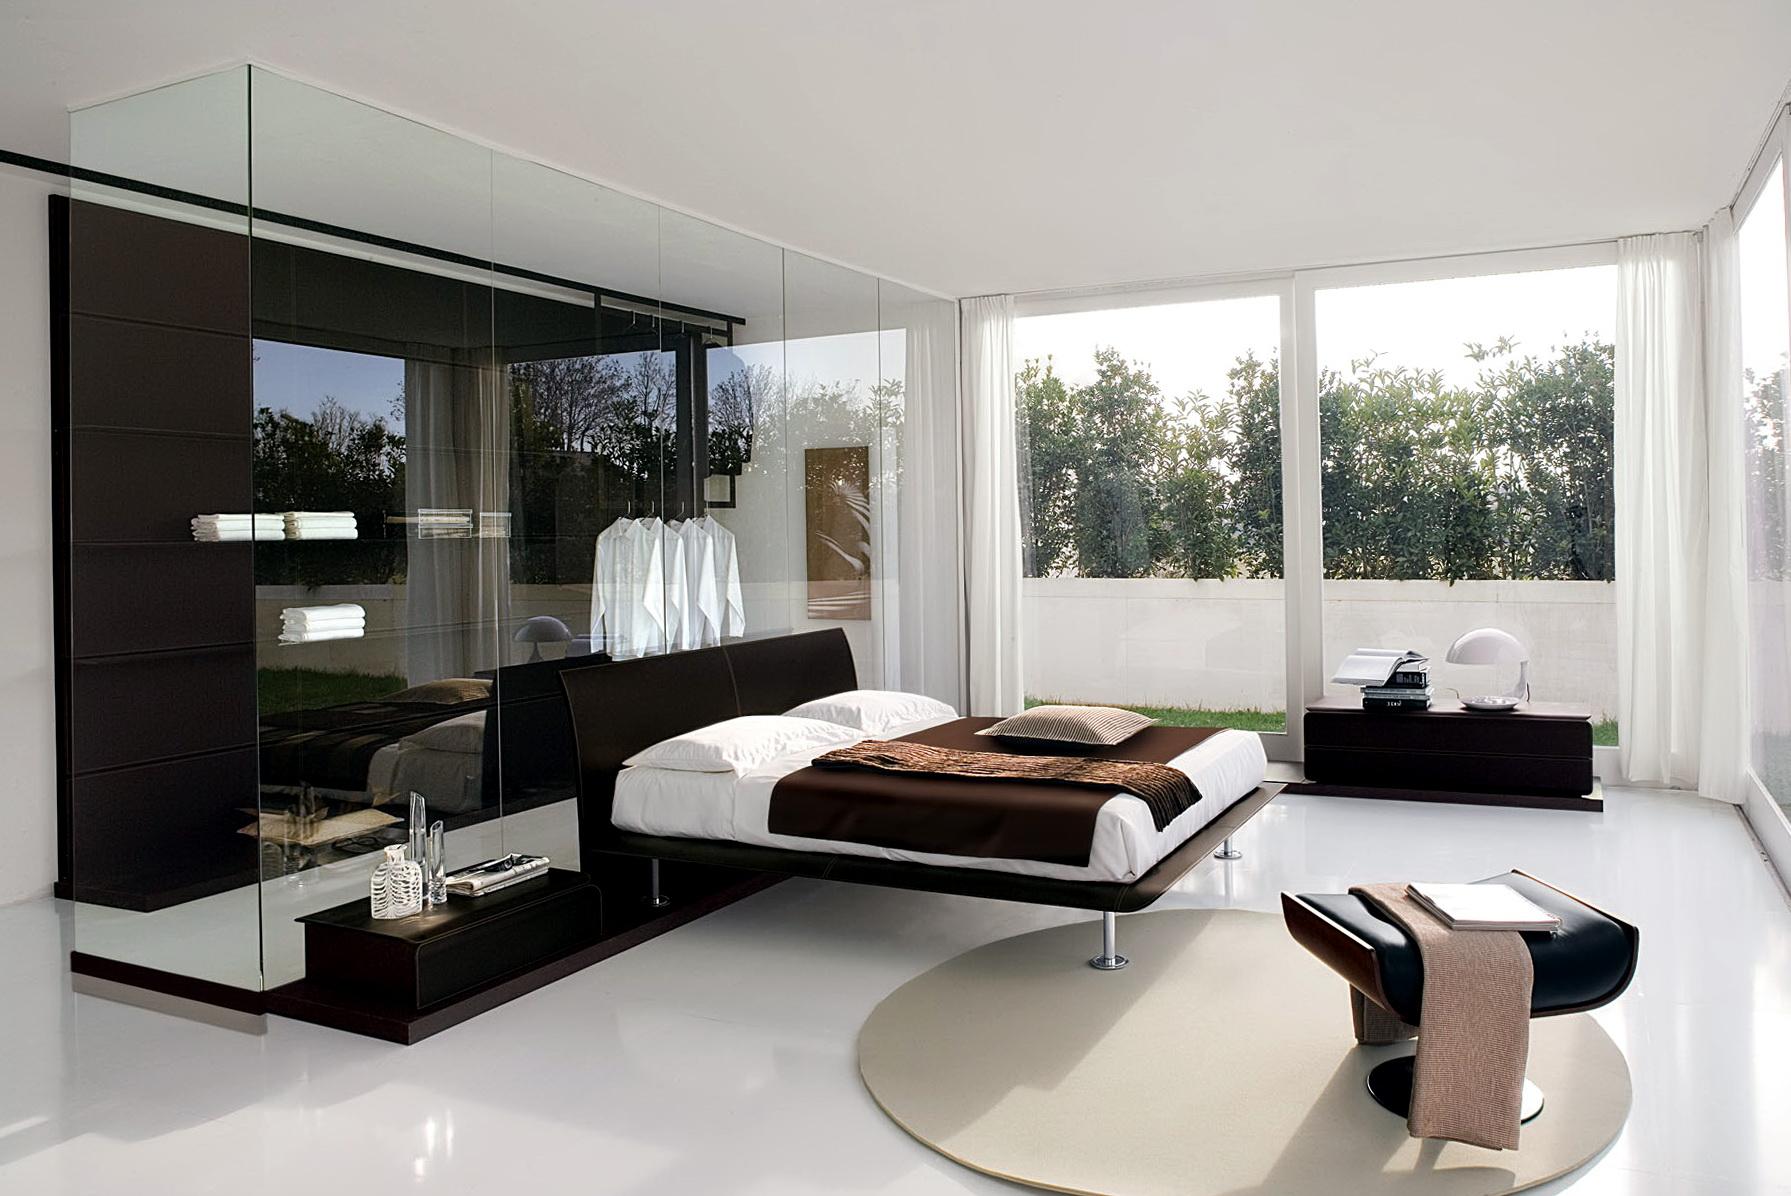 Bedroom Furniture Ideas Decorating